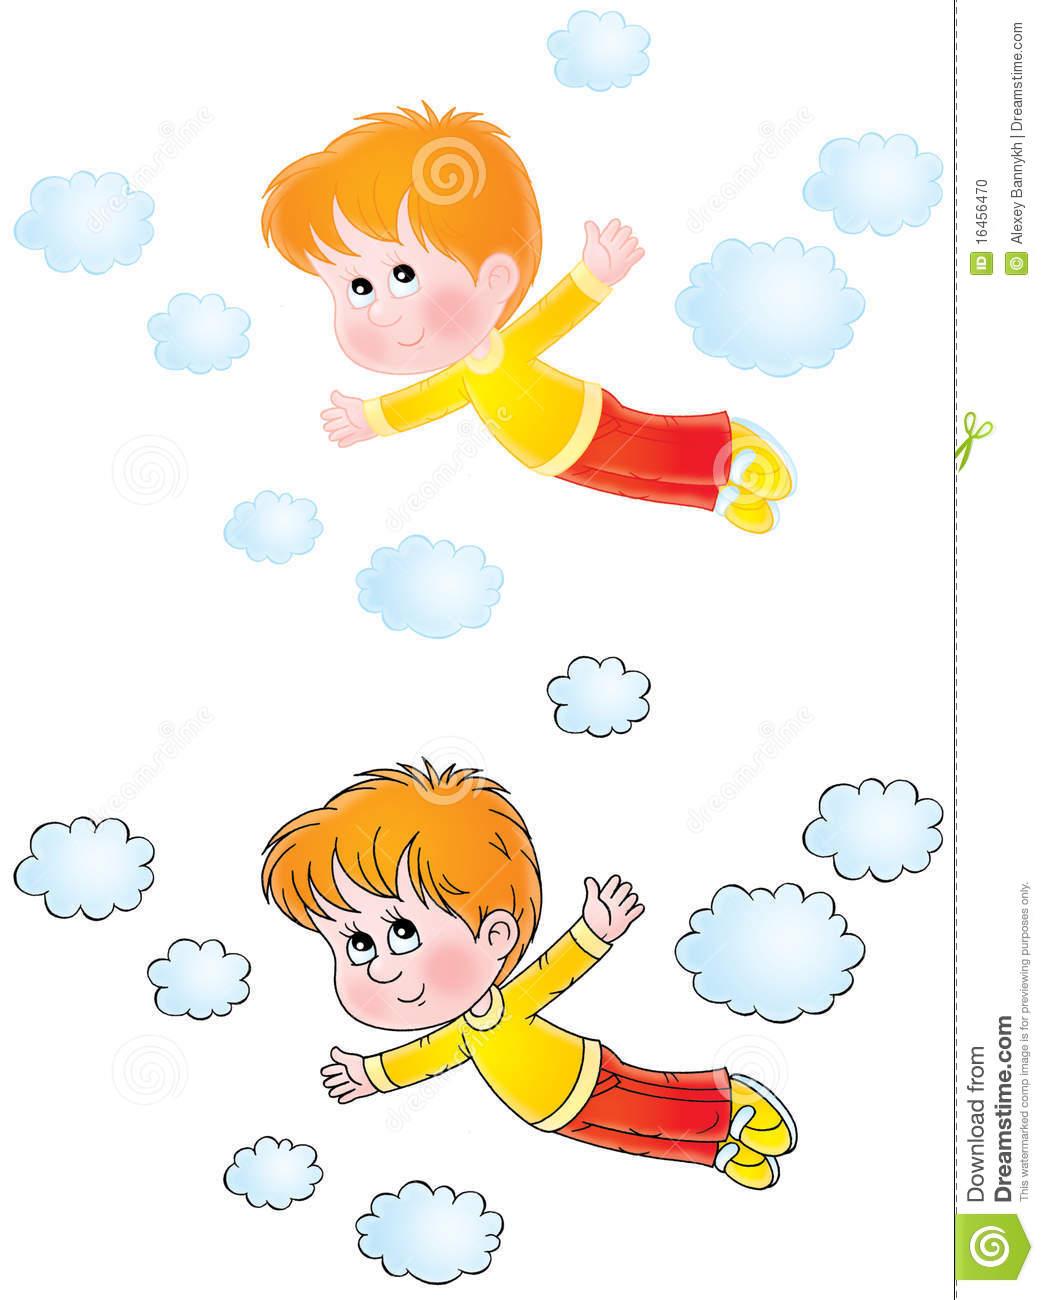 Boy flying in dreams stock illustration. Illustration of children.